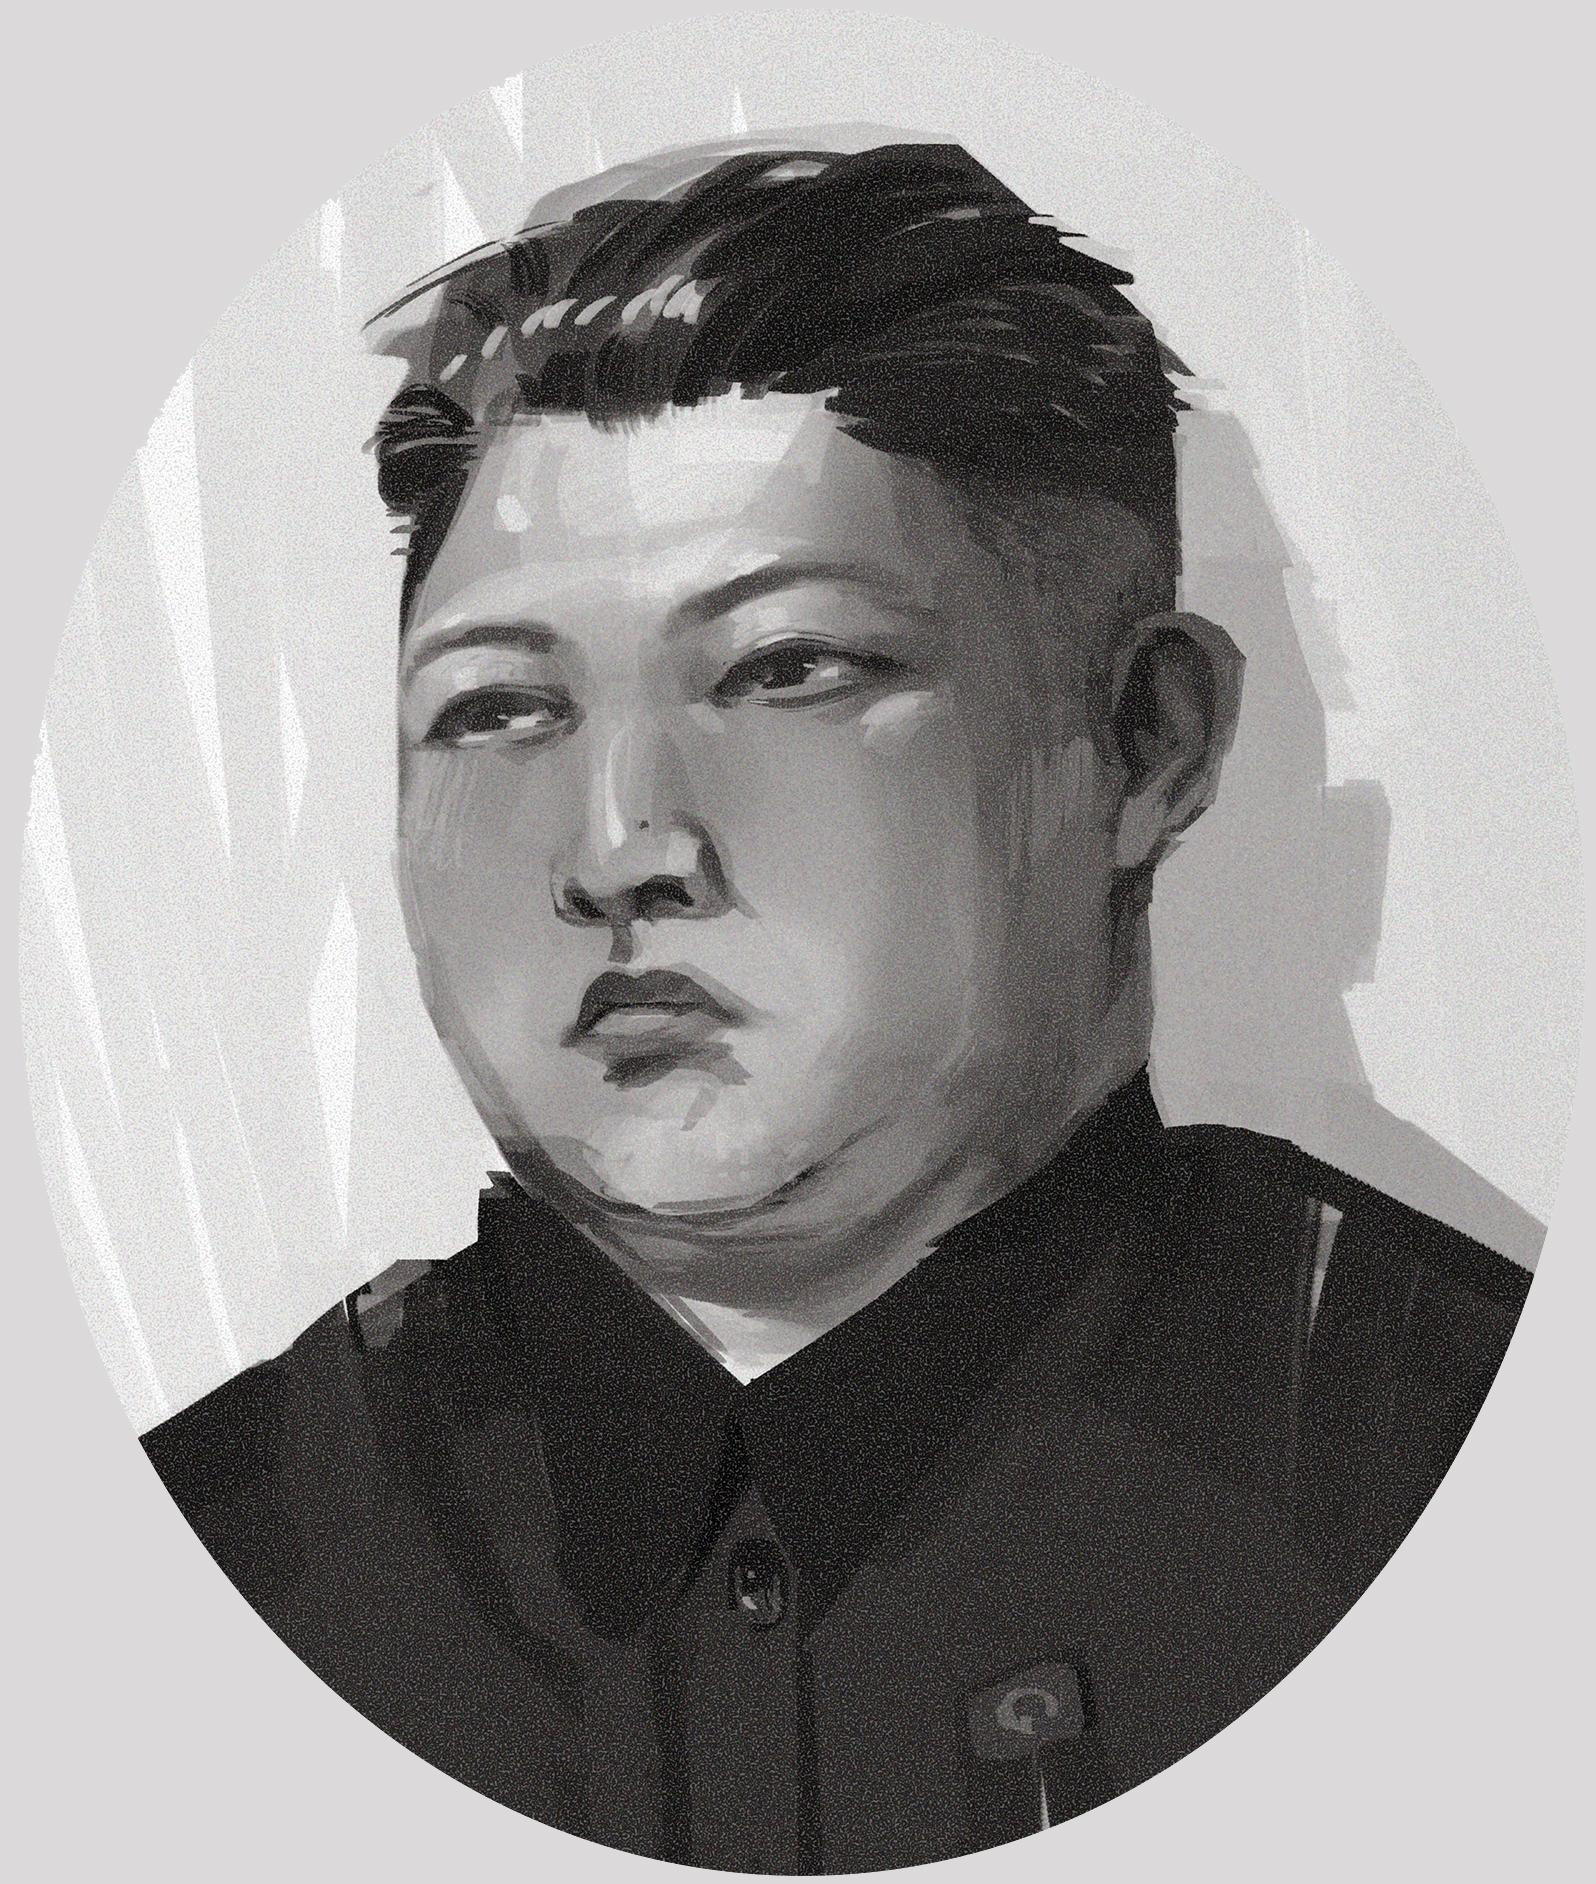 Amidst Global UN Sanctions, North Korea bans all social media, test fires new missile